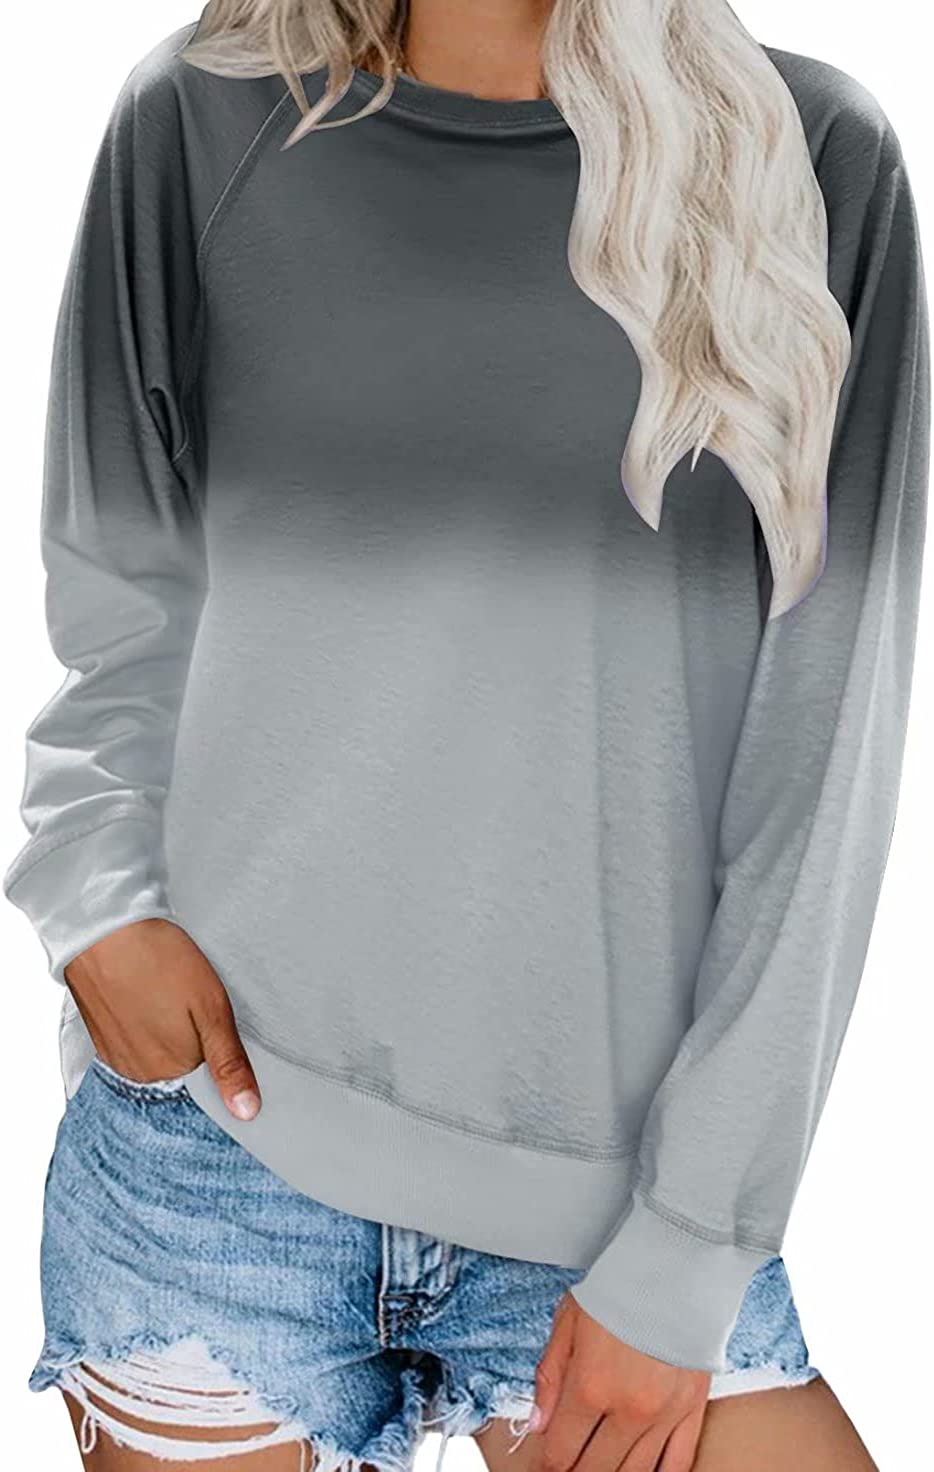 Dokotoo Womens Sweatshirt Ladies Raglan Long Sleeve Crewneck Color Block Tie Dye Sweatshirt Pullovers Casual T-Shirts Tops and Blouses XX-Large